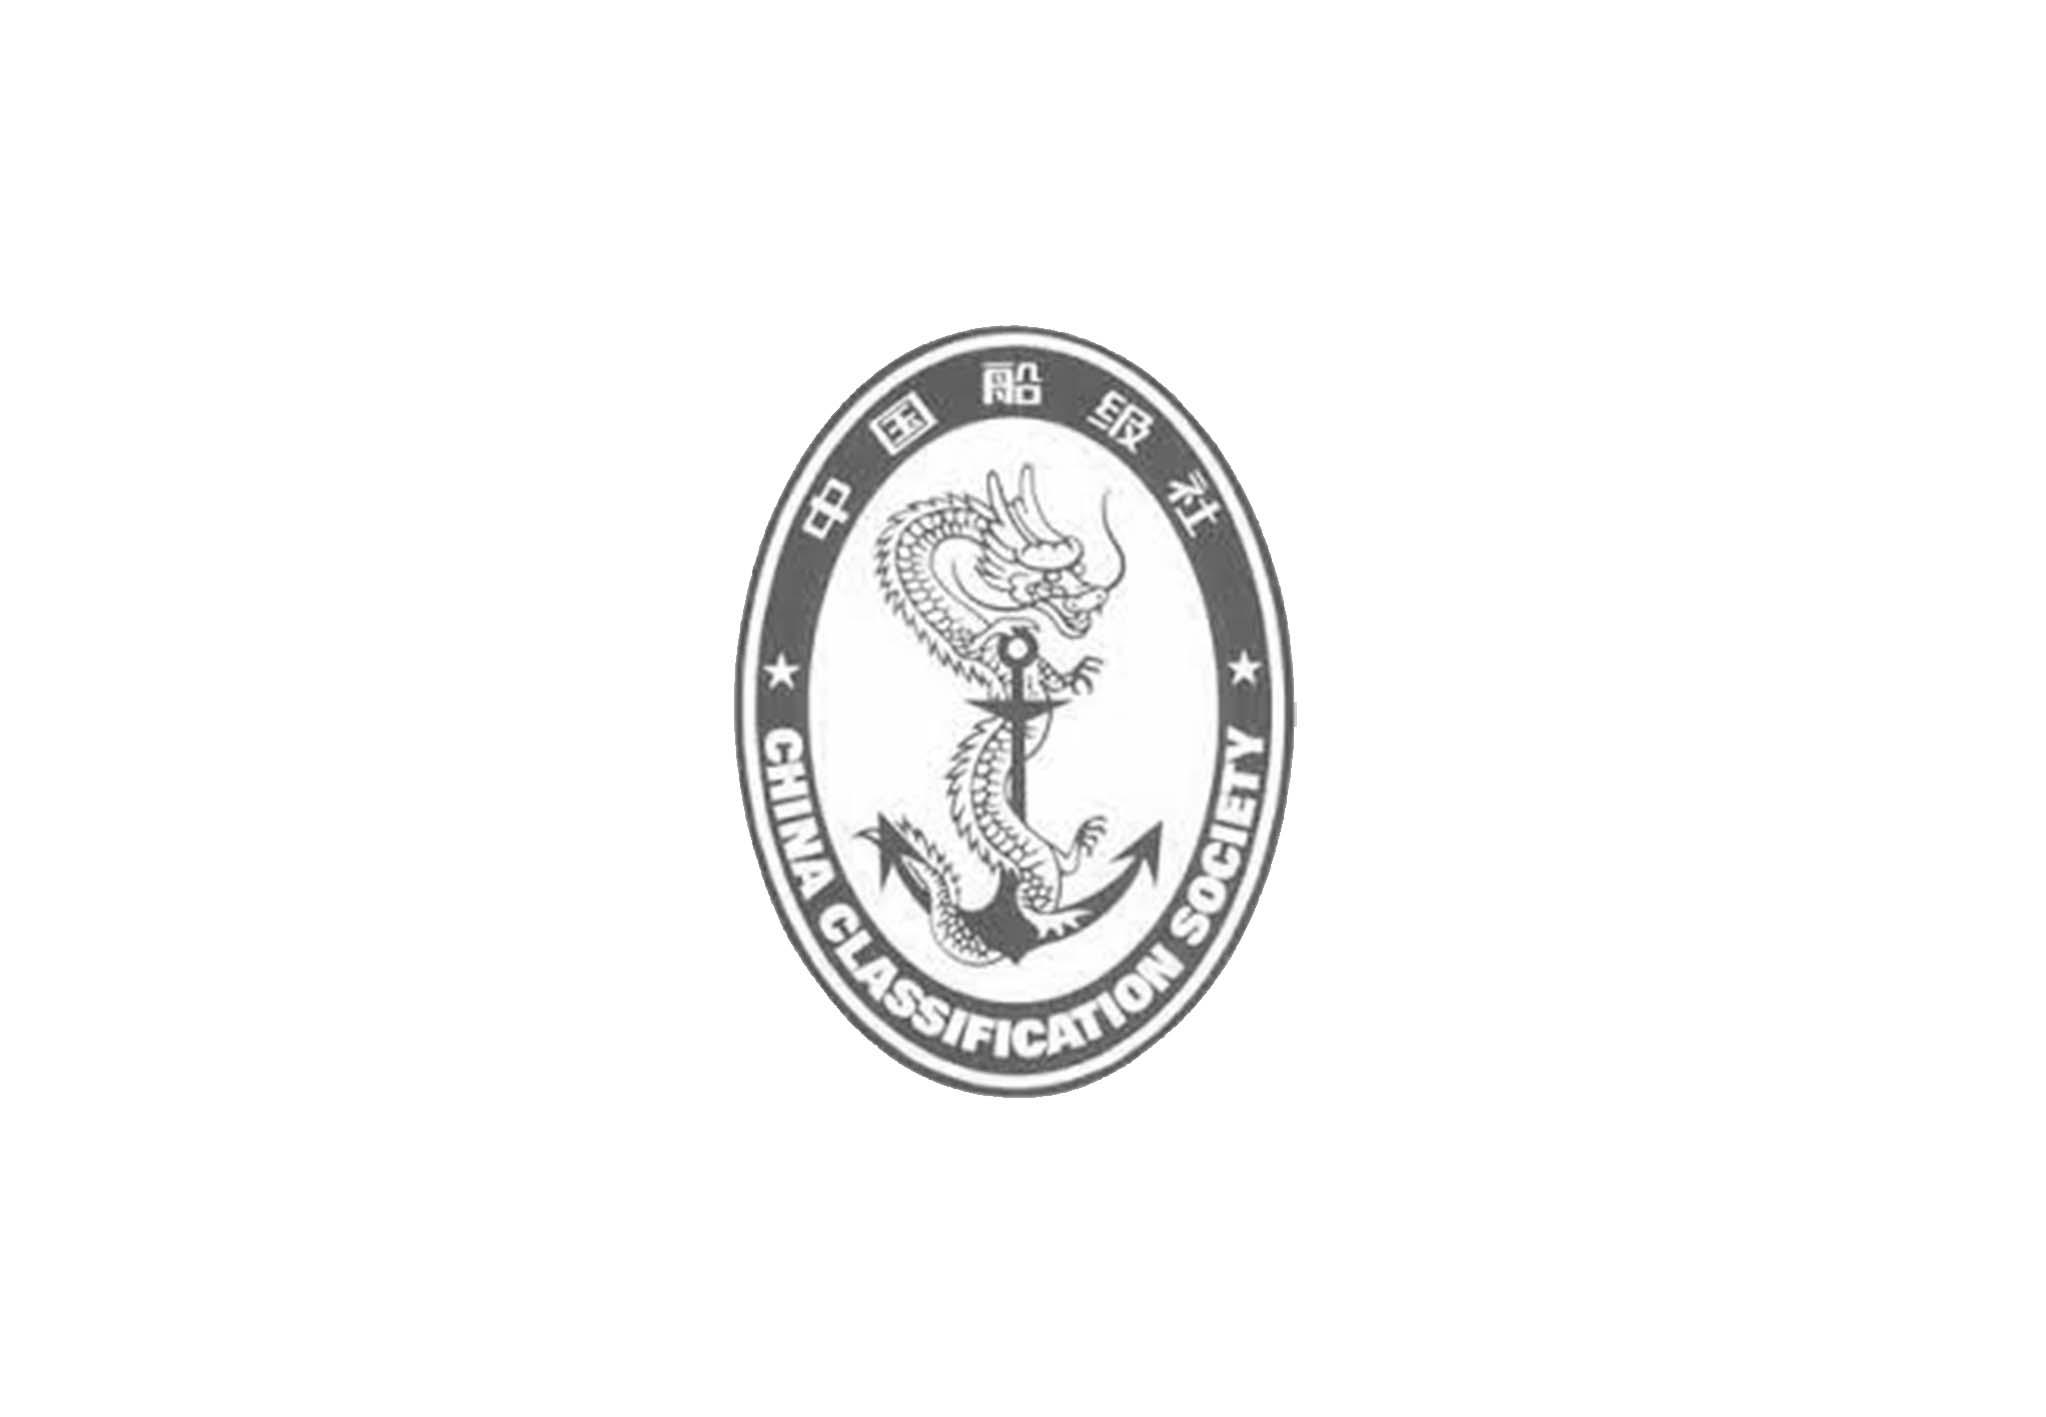 Neuenhauser Kompressorenbau Certified Company